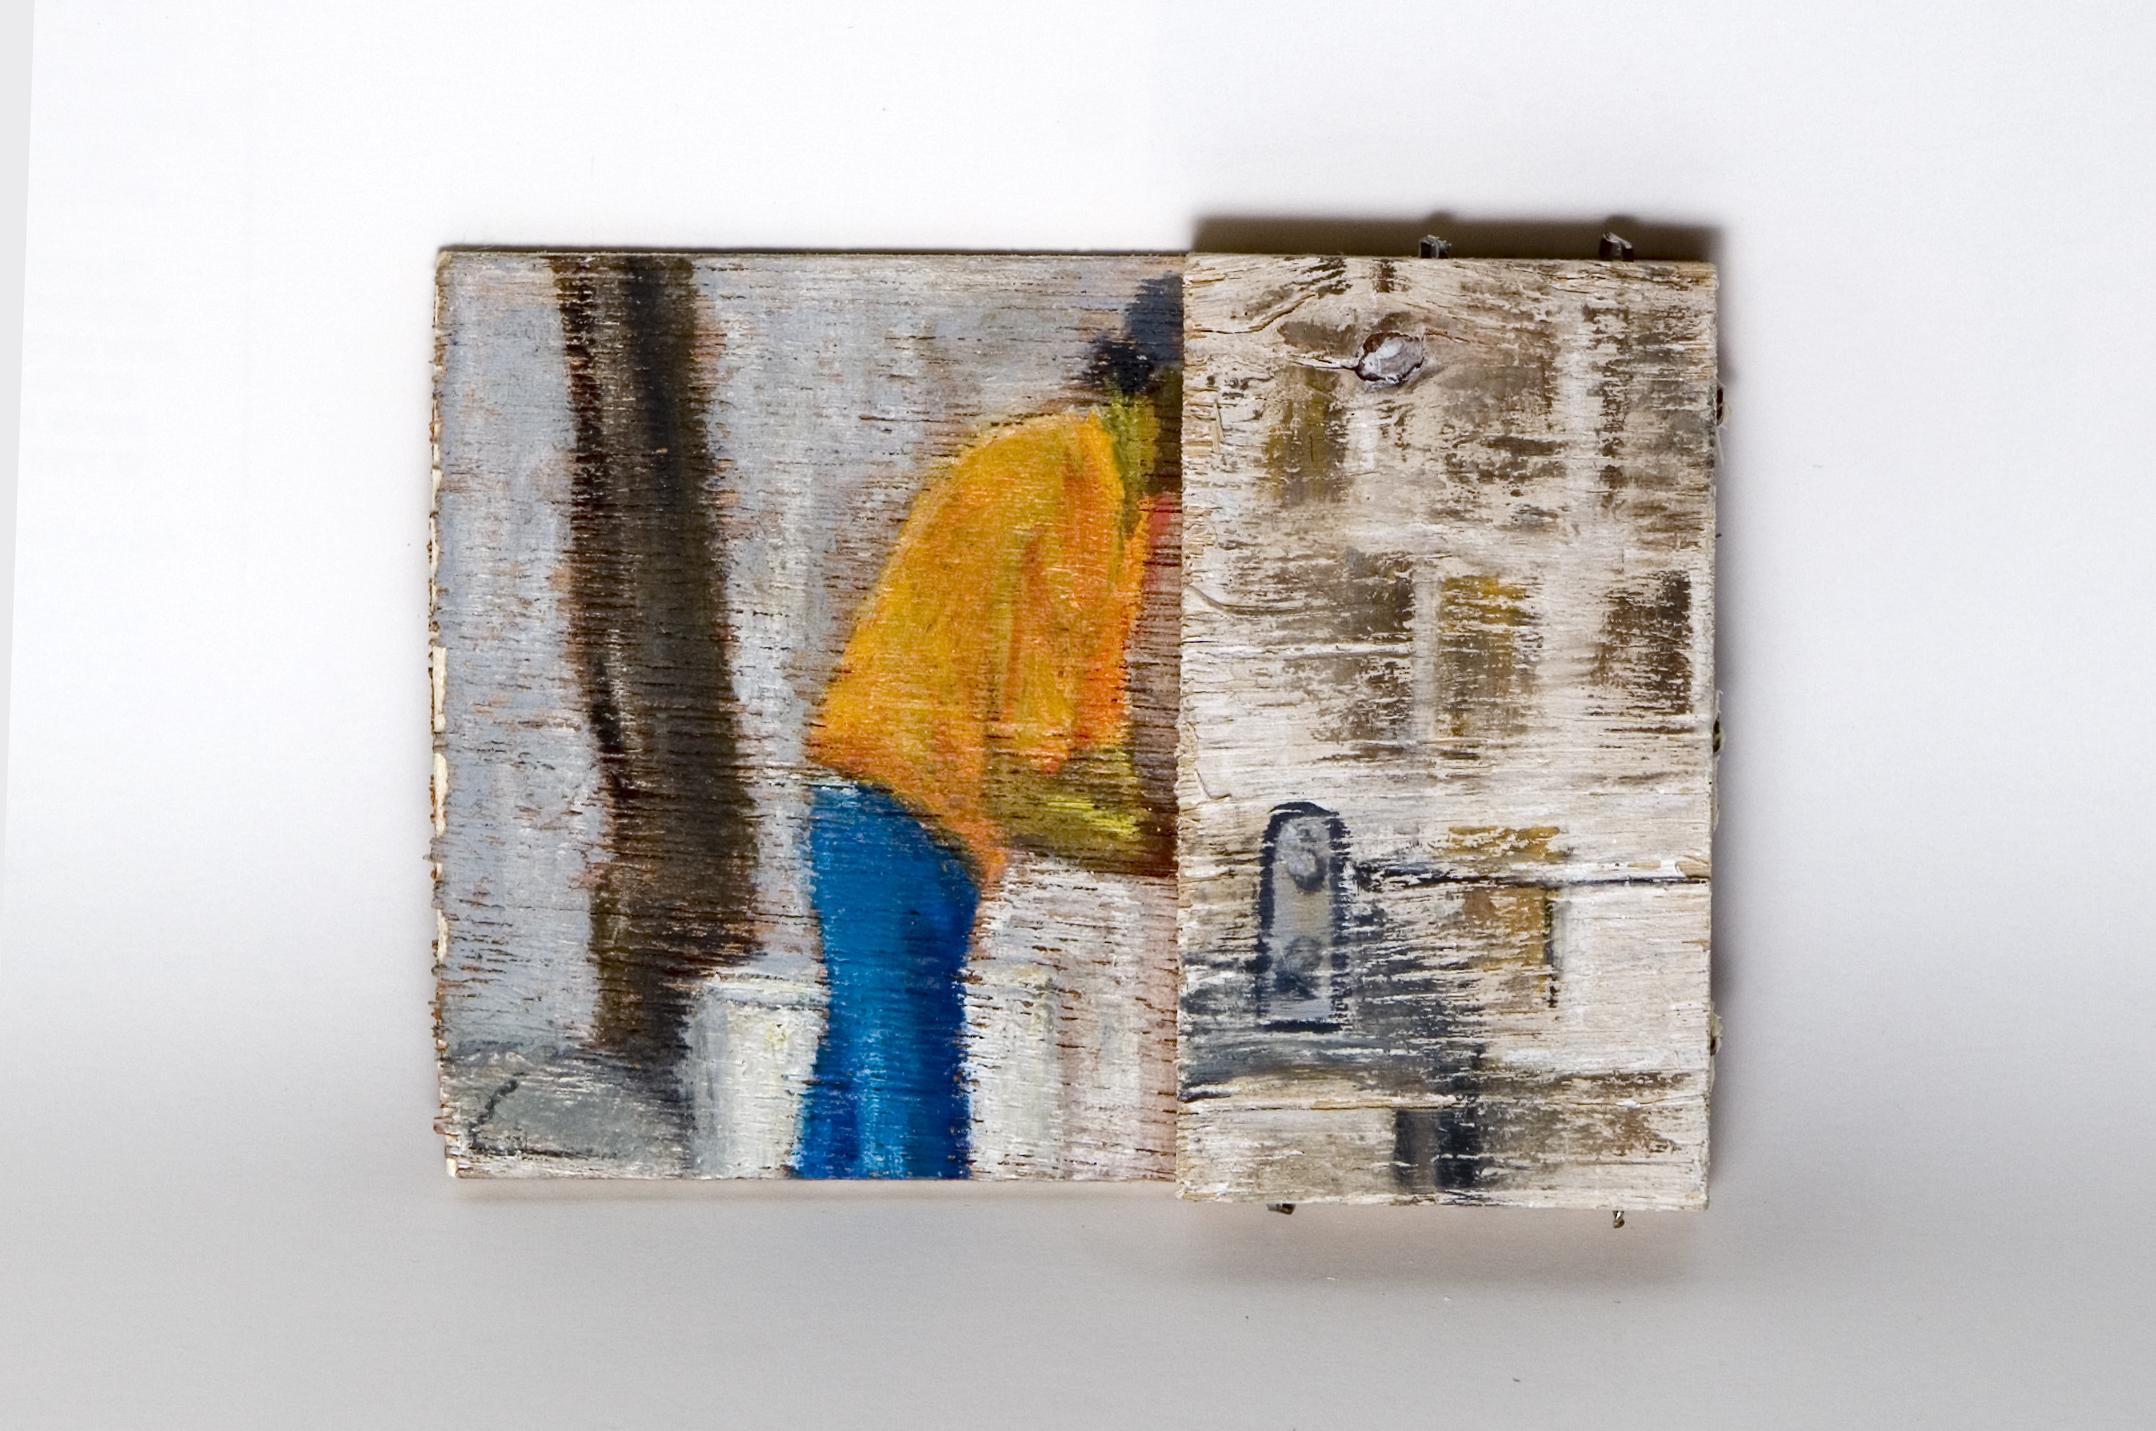 Untitled - 2009 - acrylic and pastel on wood - 16X8cm